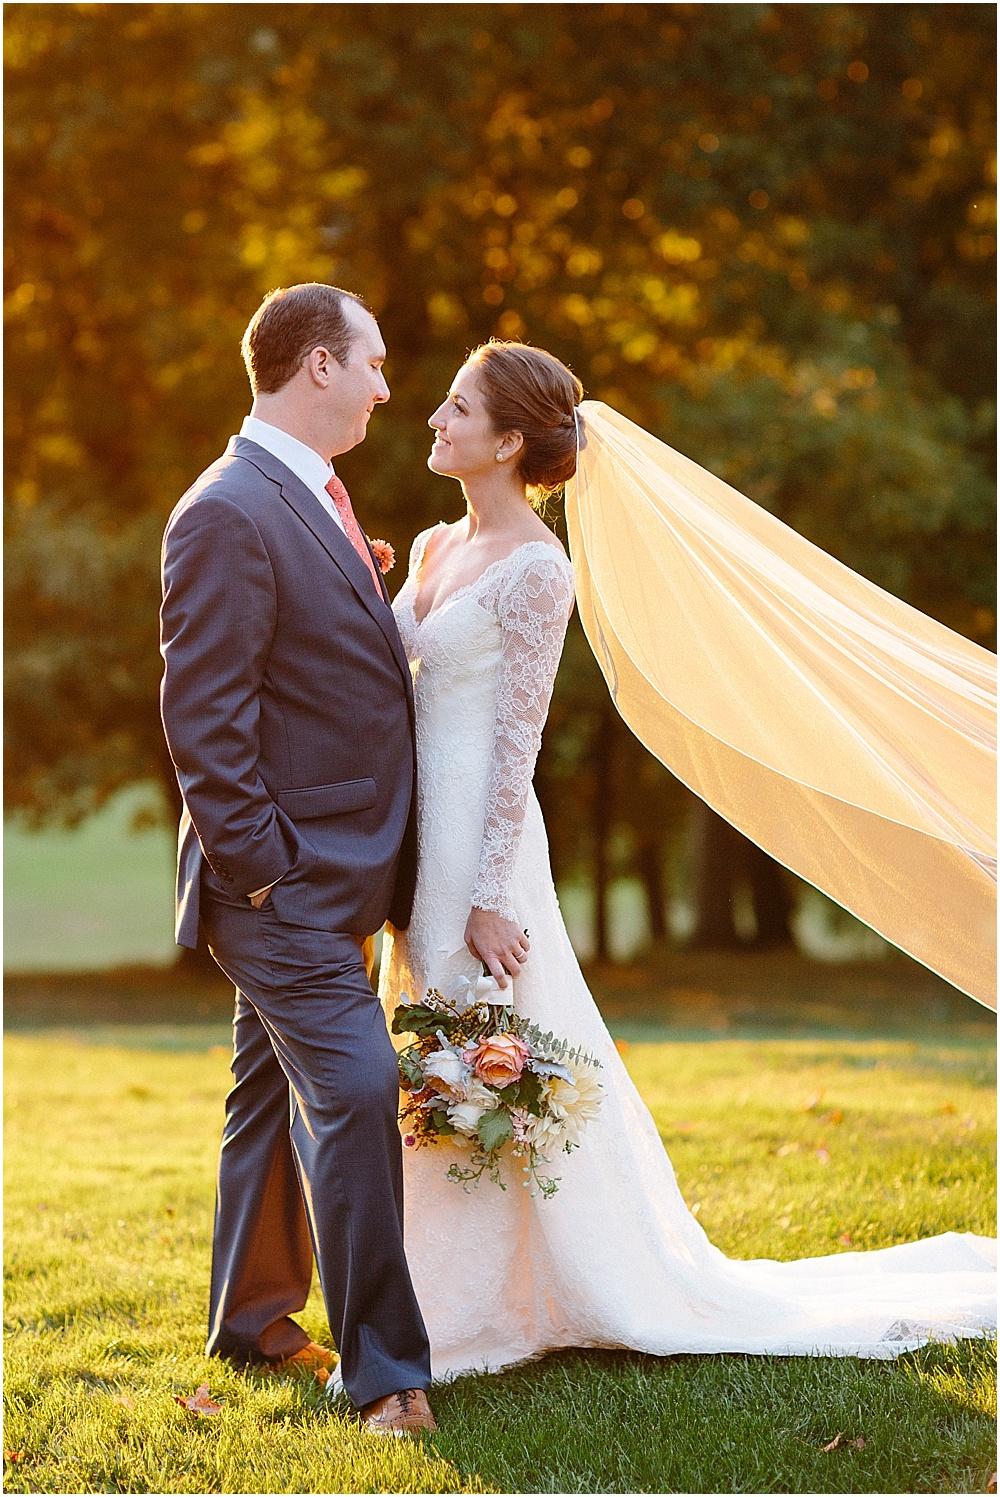 Vane_Baltimore_Country_Club_Wedding_Baltimore_Wedding_Photographer_0151